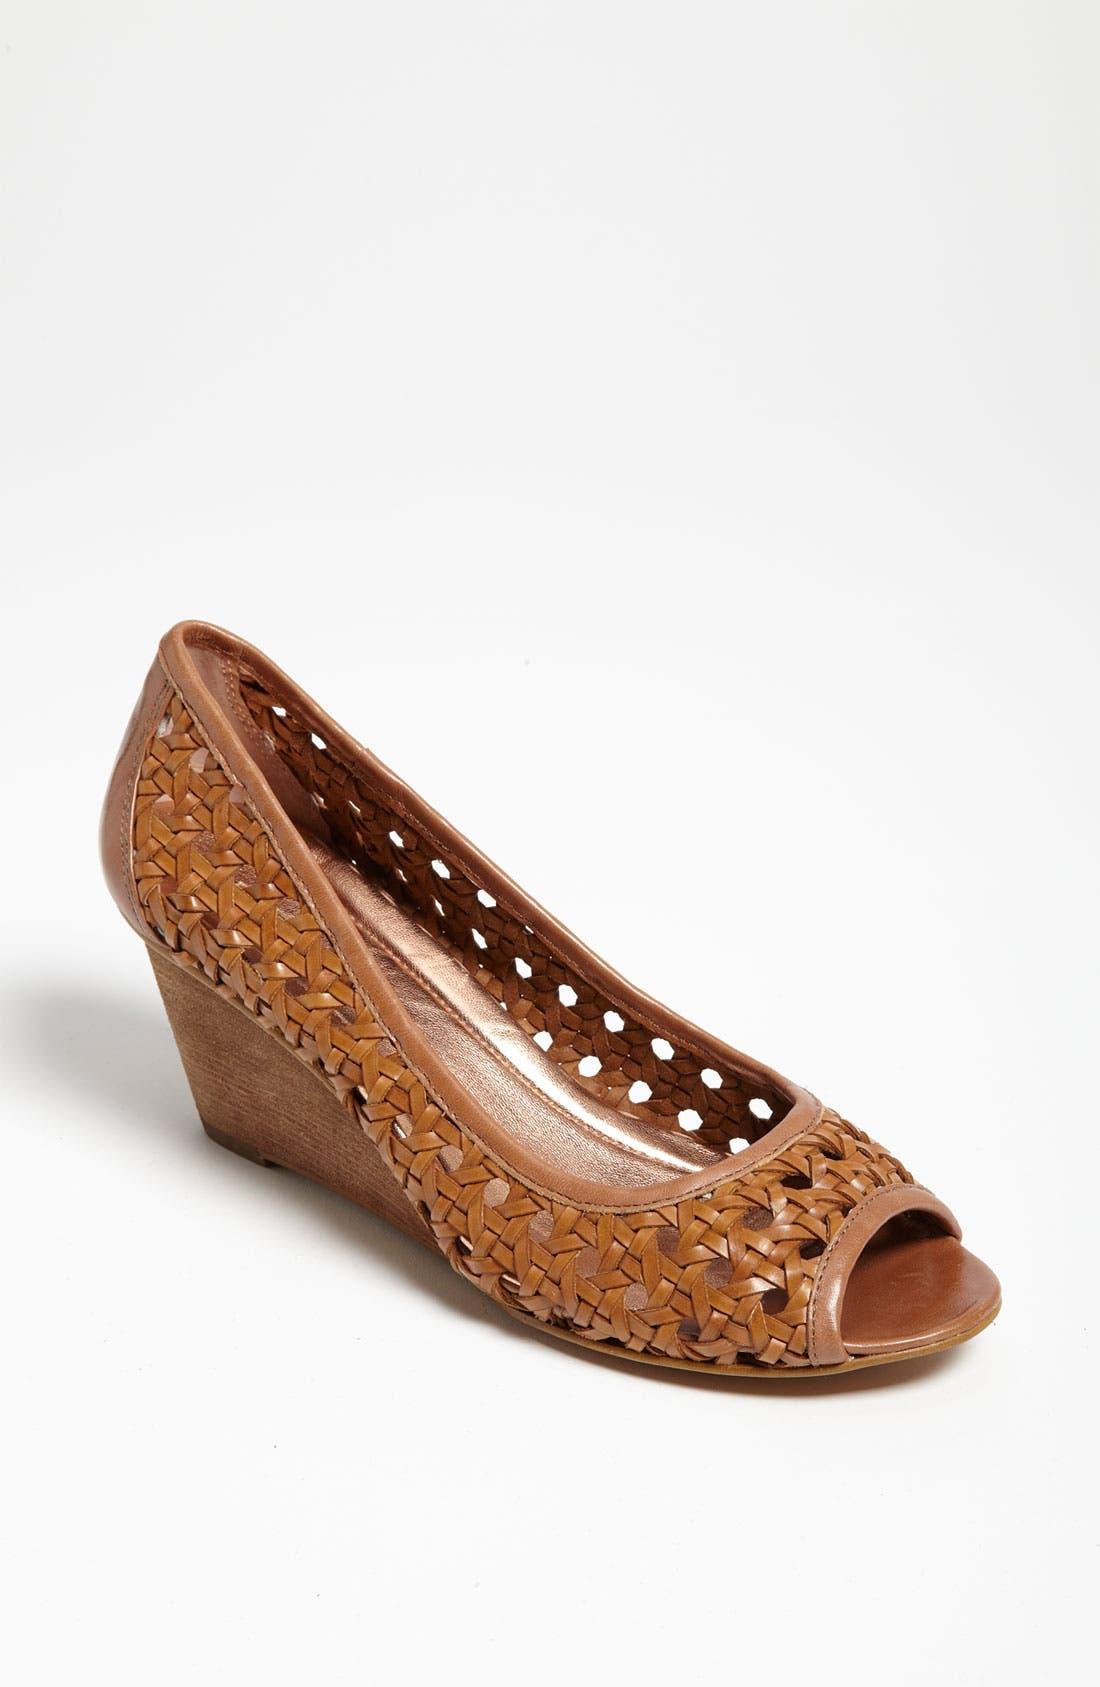 Alternate Image 1 Selected - BCBGeneration 'Tylar' Sandal